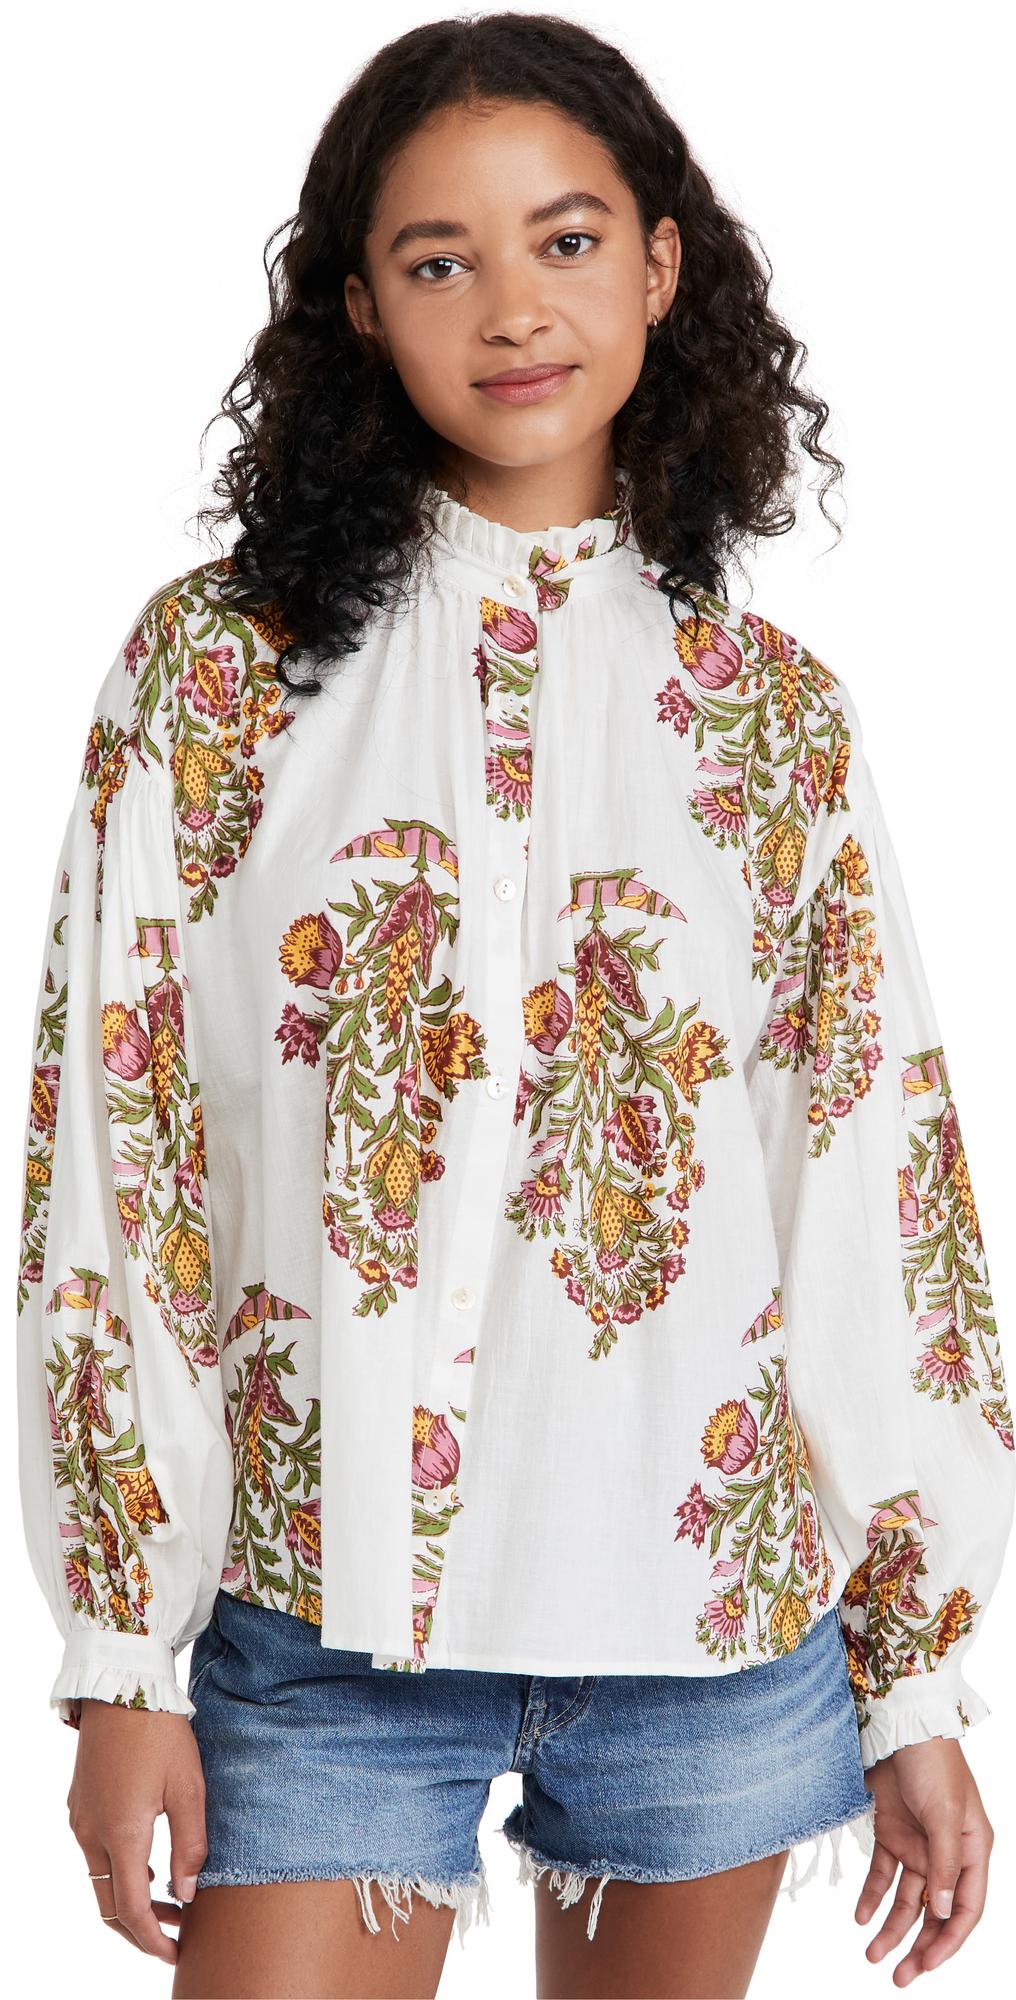 Poet Cactus Flower Shirt